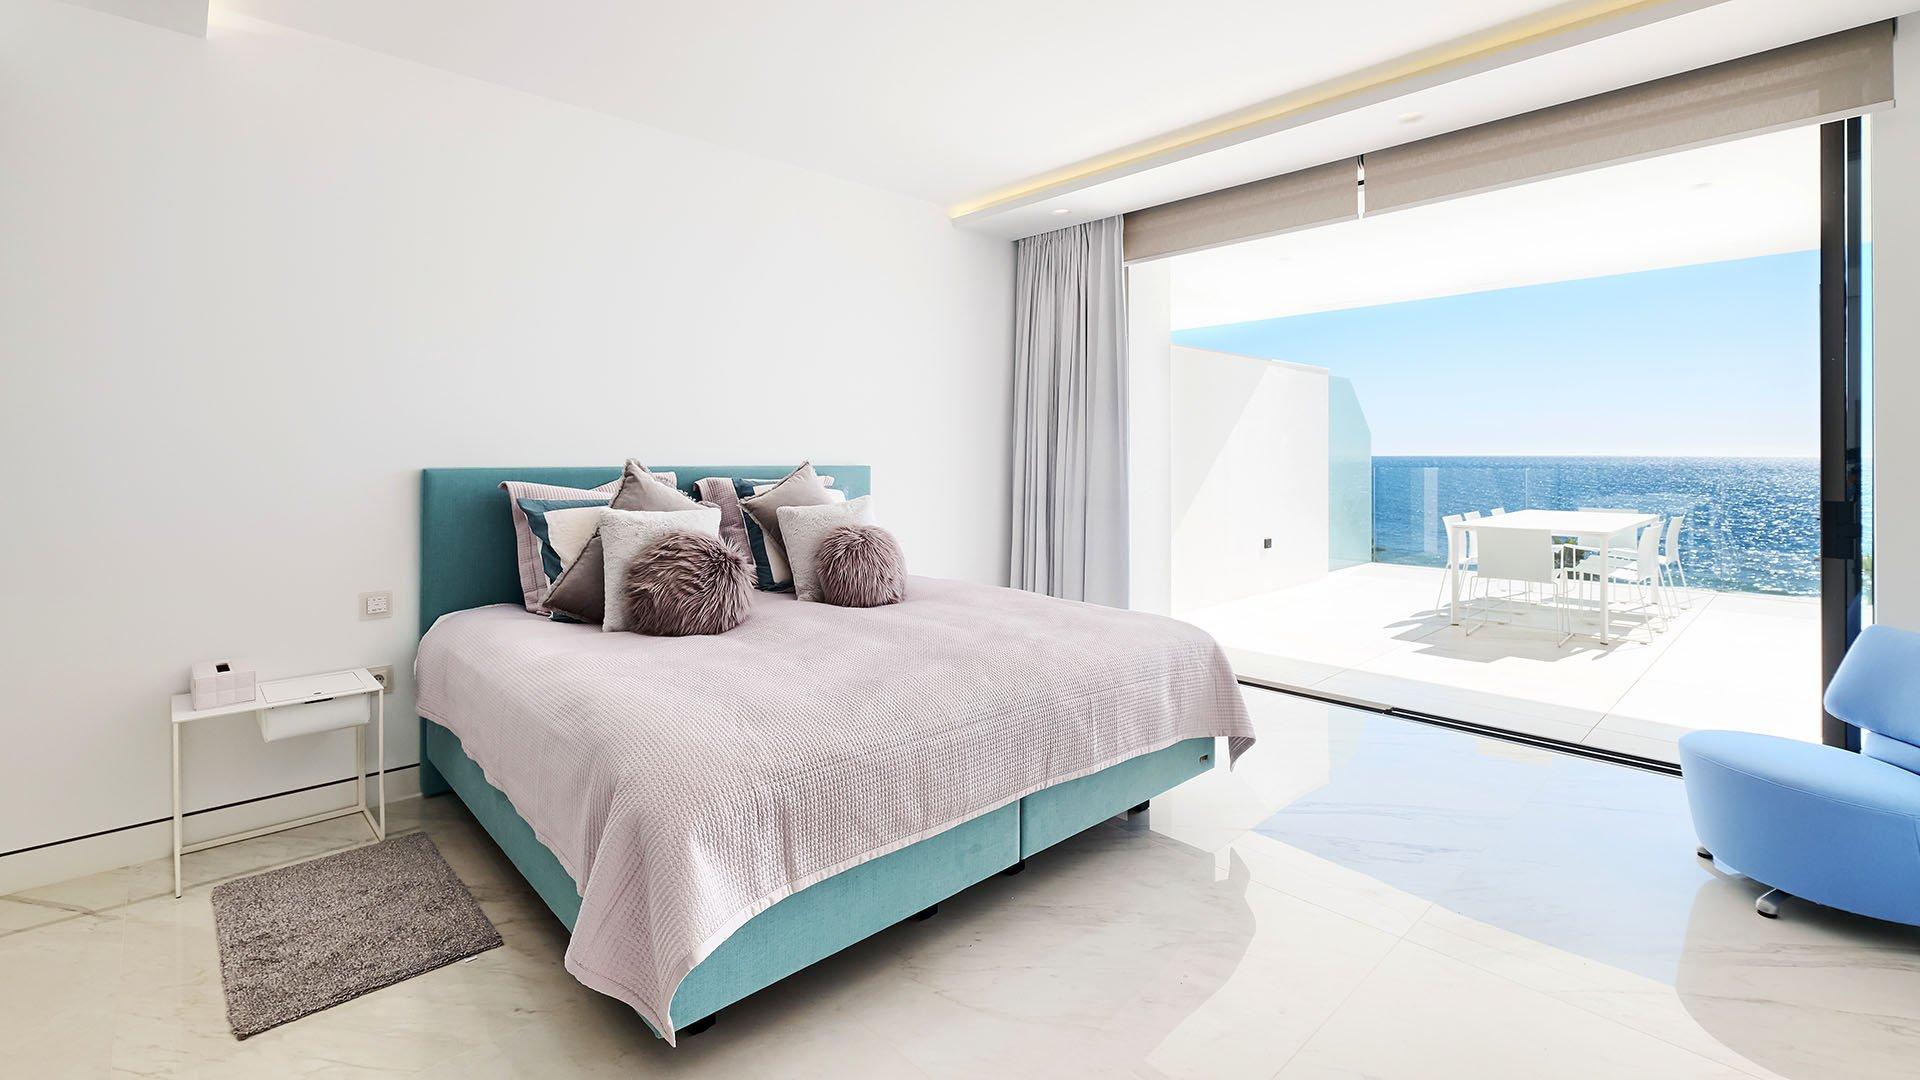 Emare: Impressive luxury beachfront apartment on the New Golden Mile